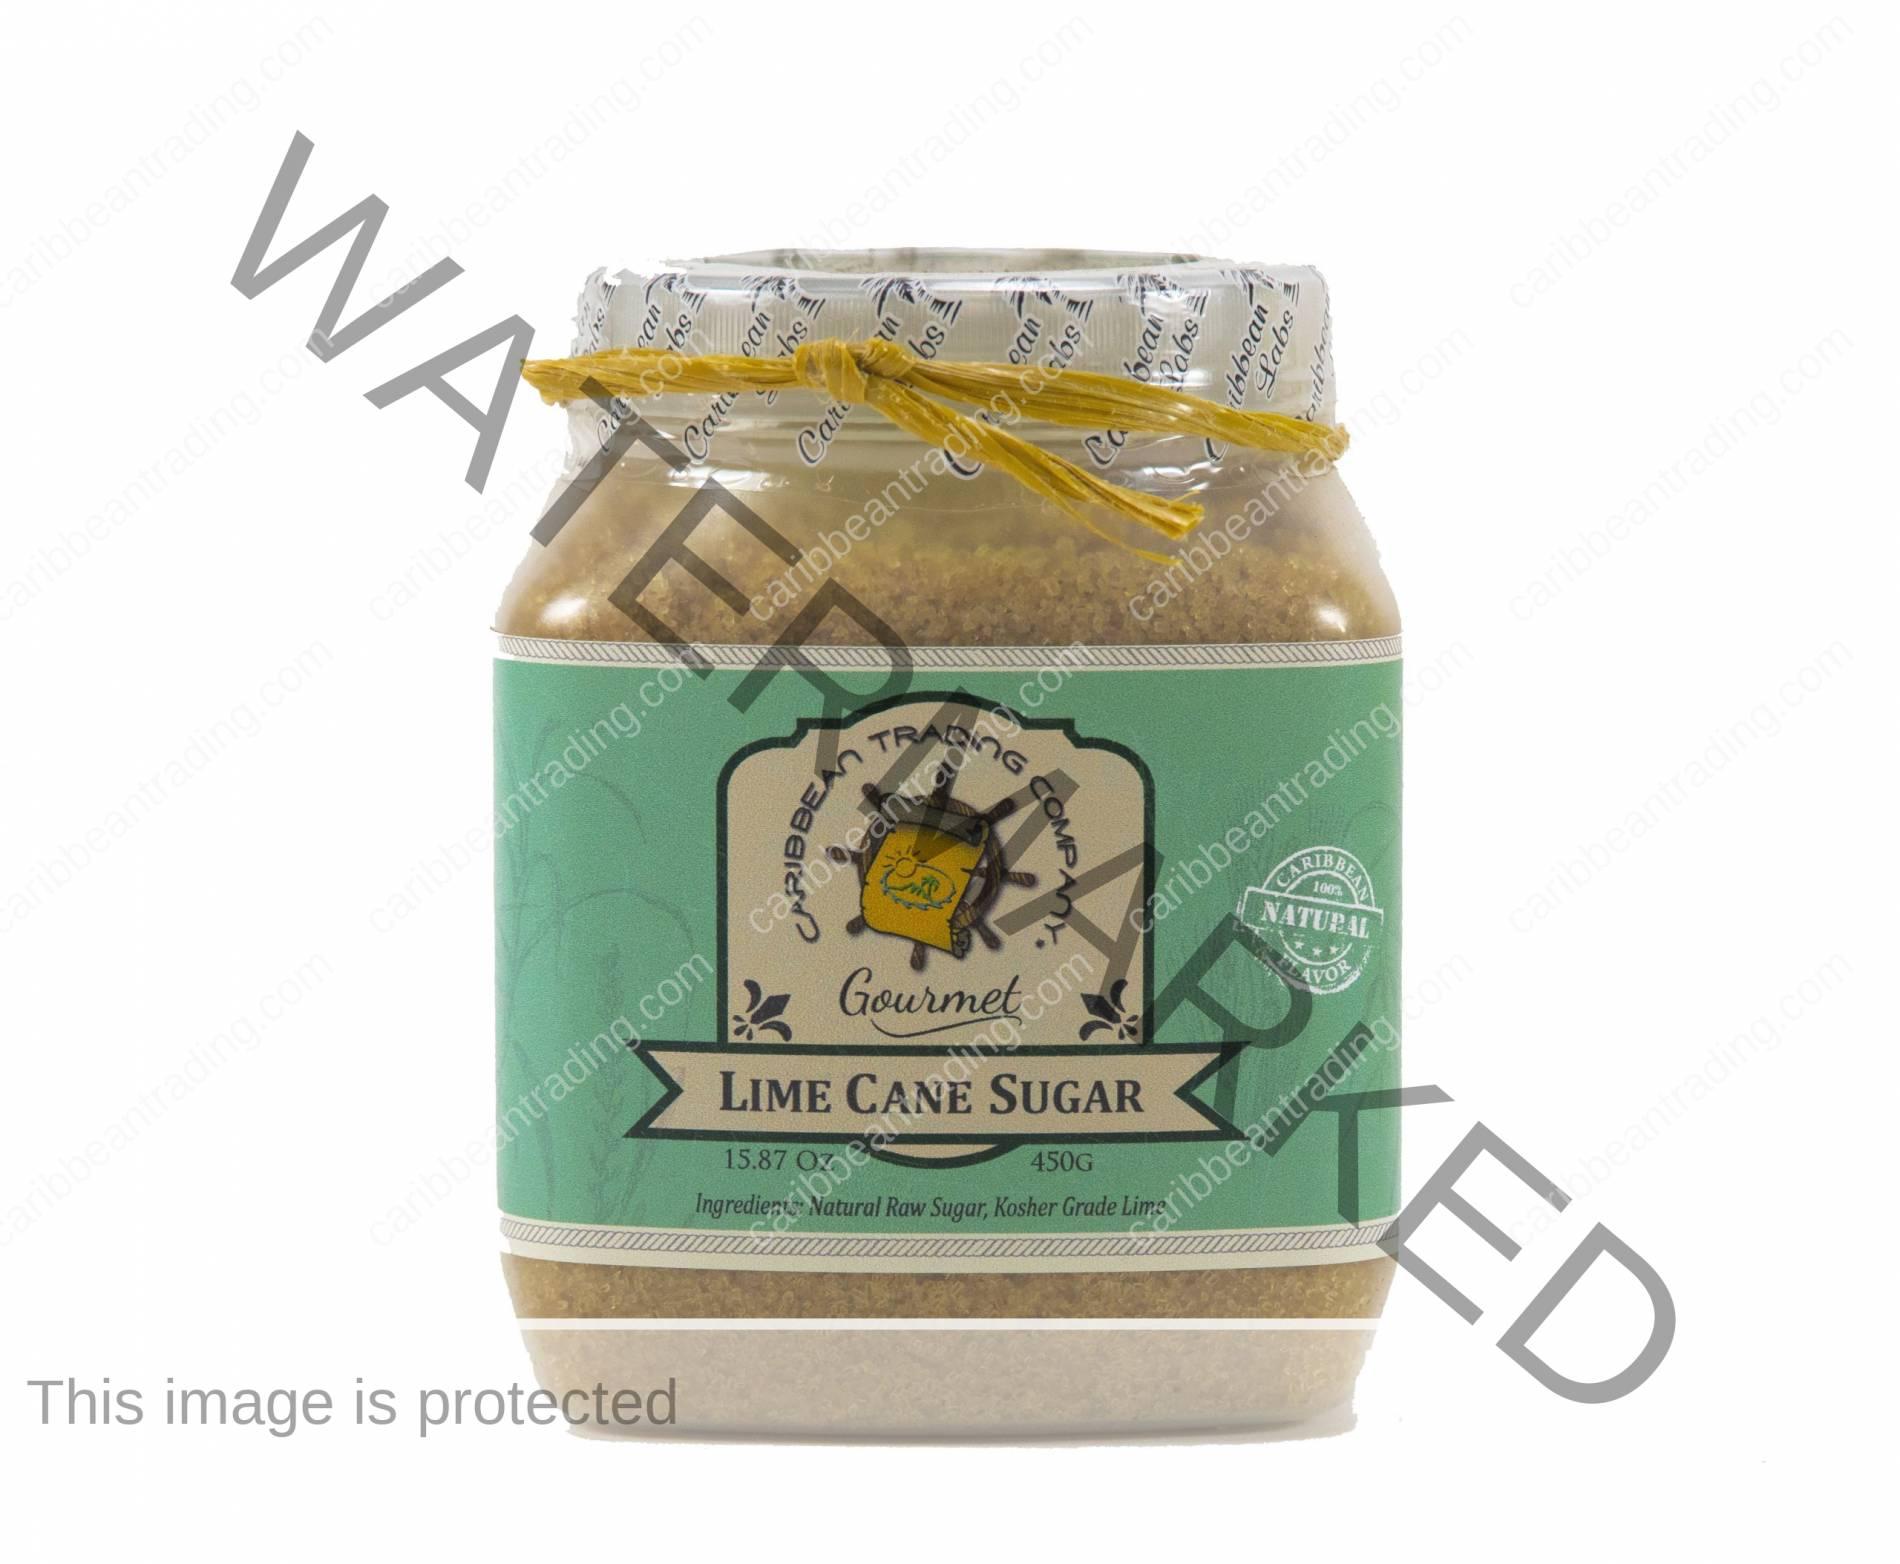 Lime Cane Sugar - 15.87 oz.